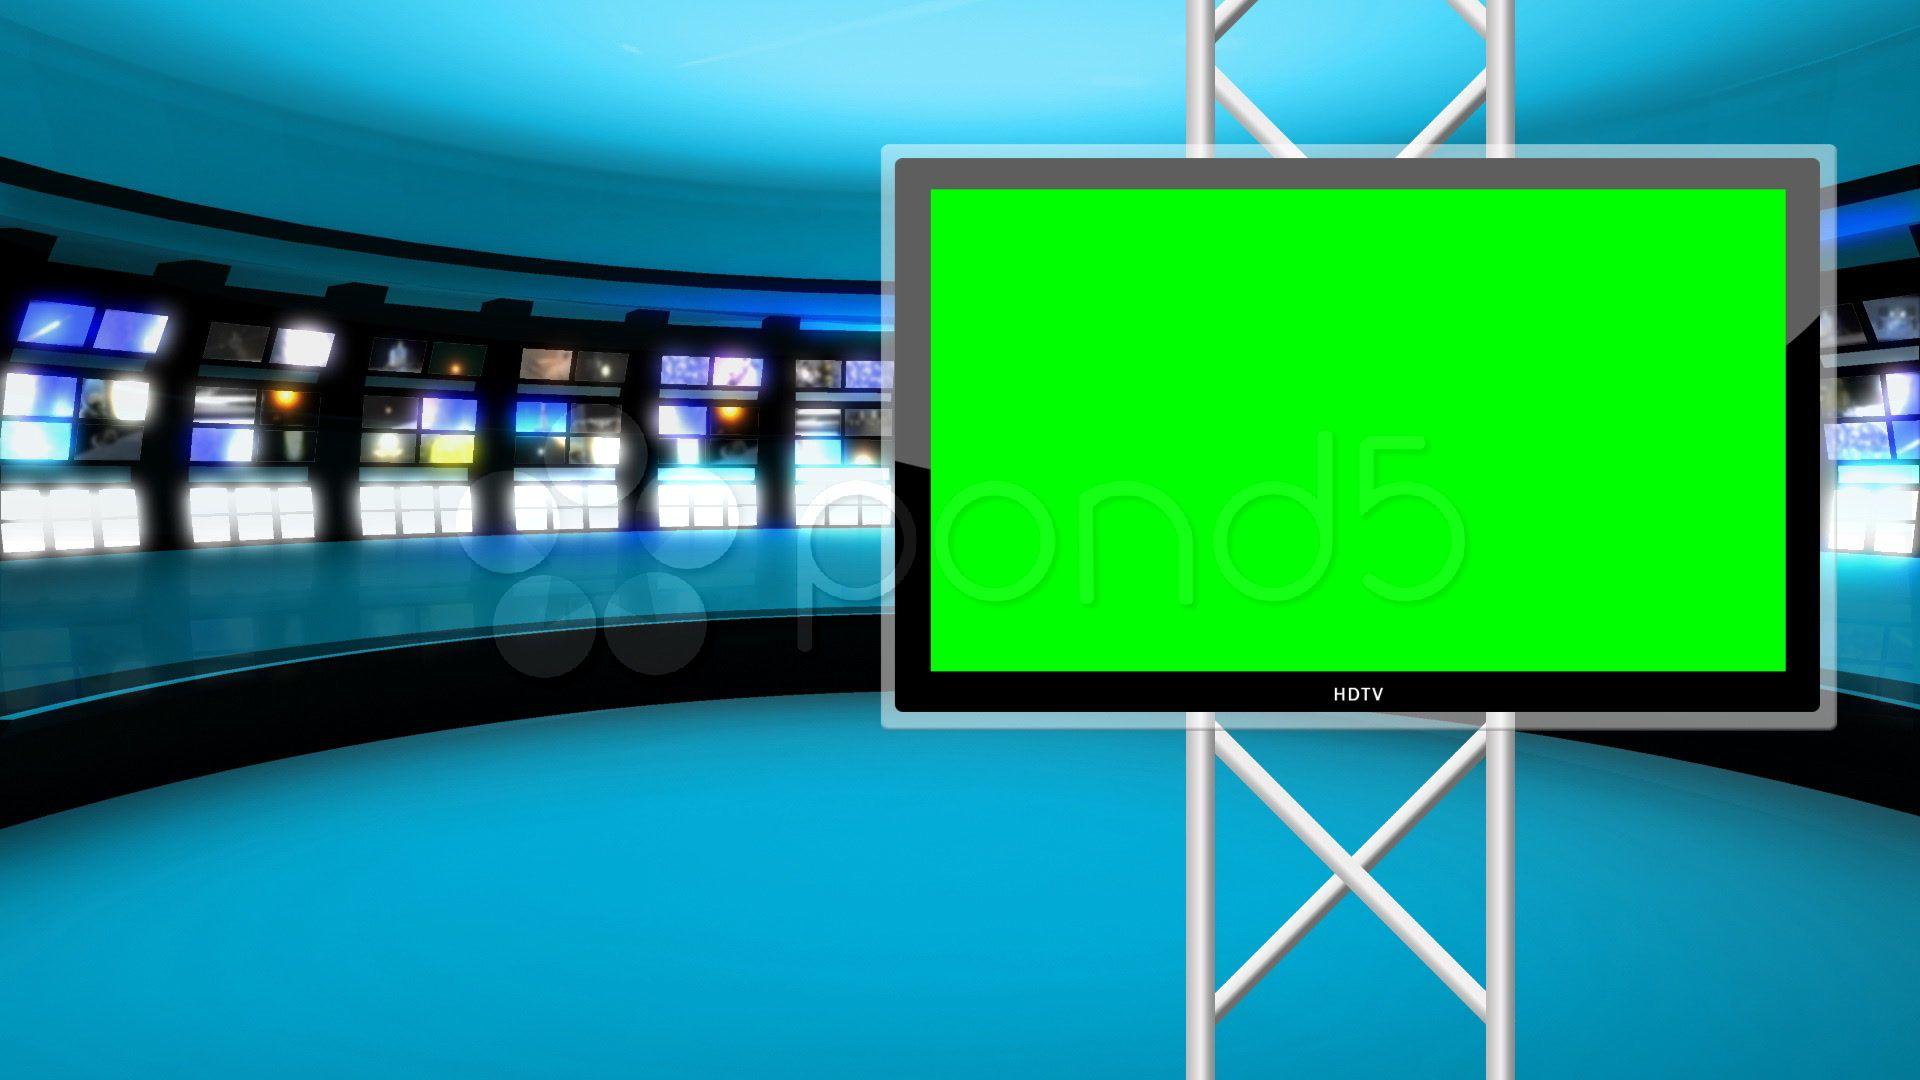 News Studio 9 Virtual Green Screen News Background Stock Footage Ad Virtual Green Studio News Greenscreen Green Screen Backgrounds Anime Scenery Wallpaper